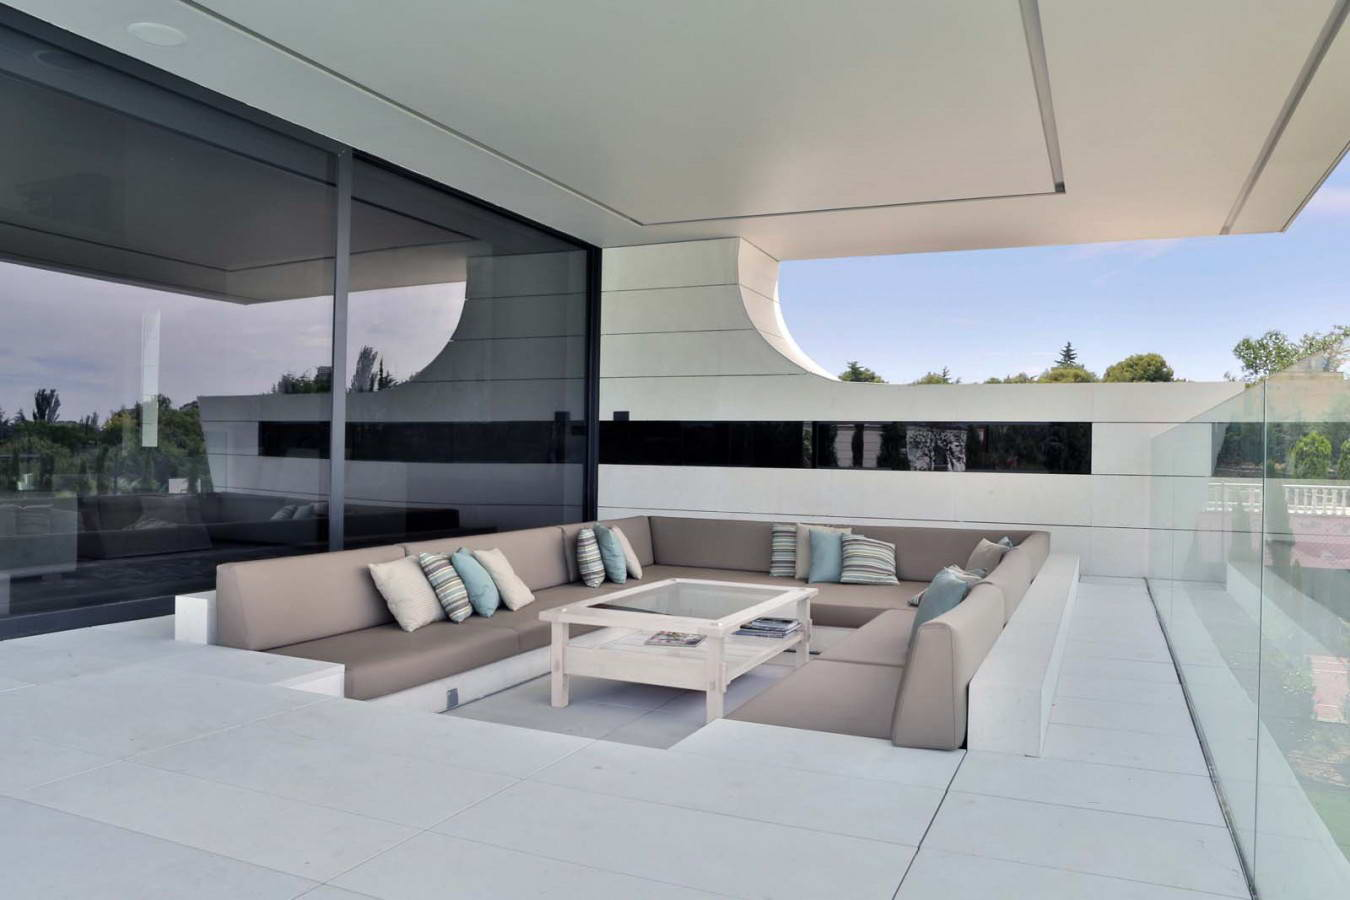 Проект дома balcony house от a-cero.